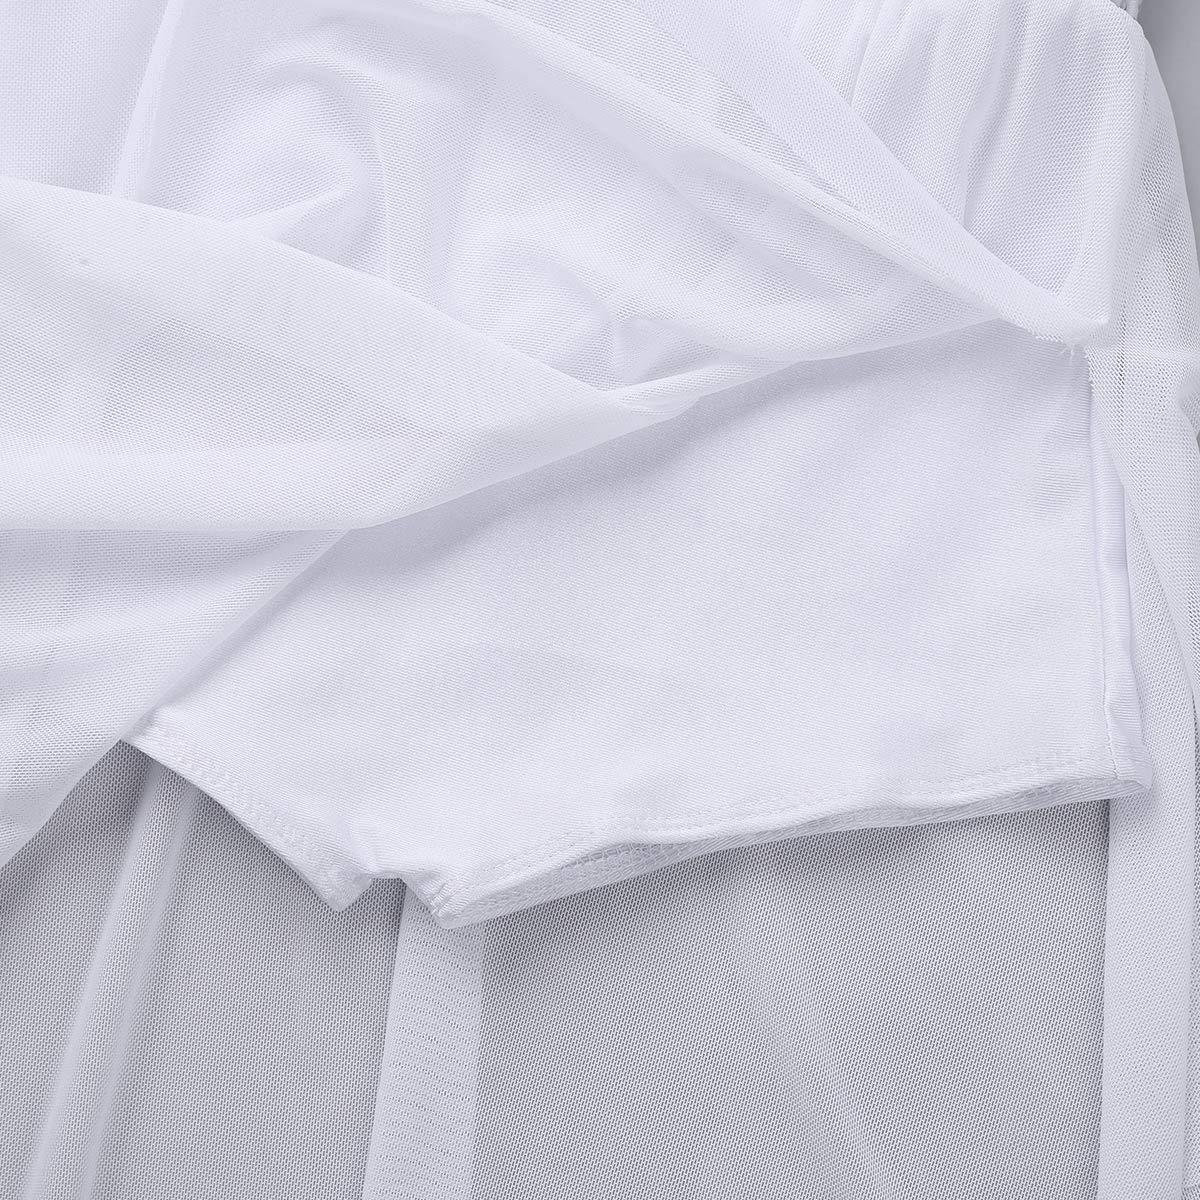 inhzoy Maillot Vestido de Ballet Ni/ña Irregular Vestido de Danza Patinaje Art/ístico con Lentejuelas Leotardo de Gimnasia Ritmica Disfraz de Fiesta Actuaci/ón